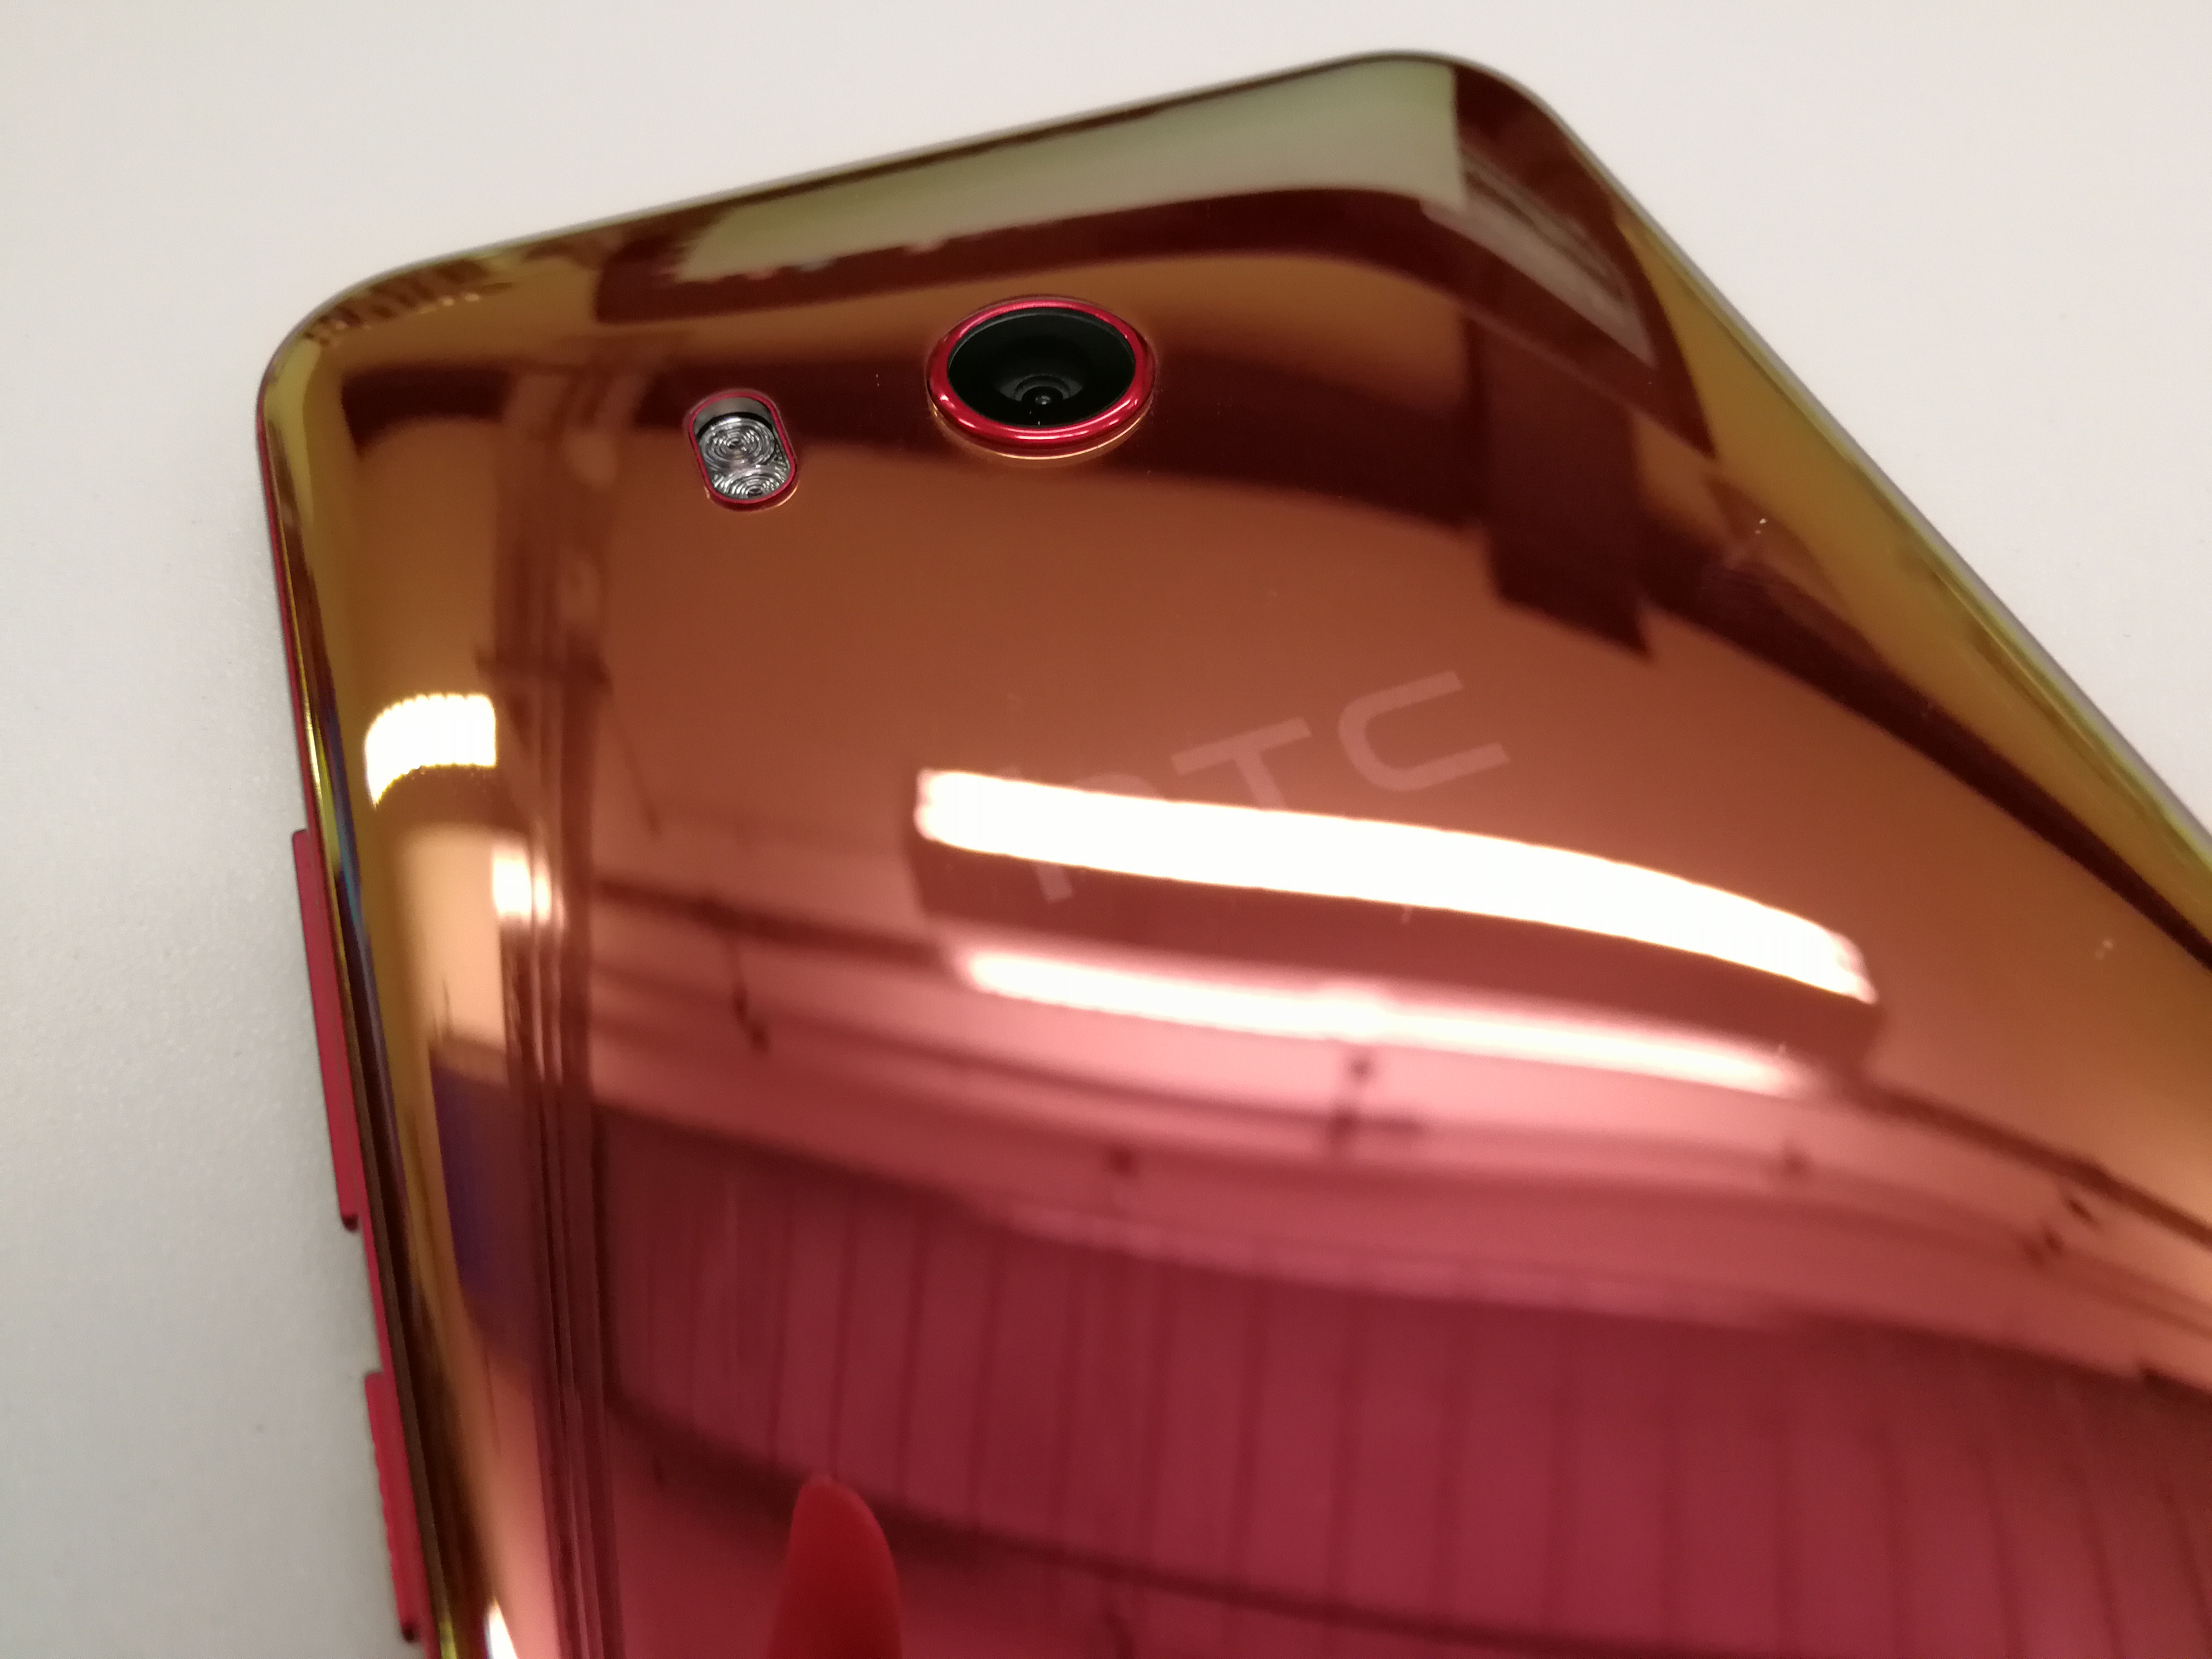 san francisco d3f71 a0ca6 The HTC U11 Giveaway: Win a Launch-Day Smartphone